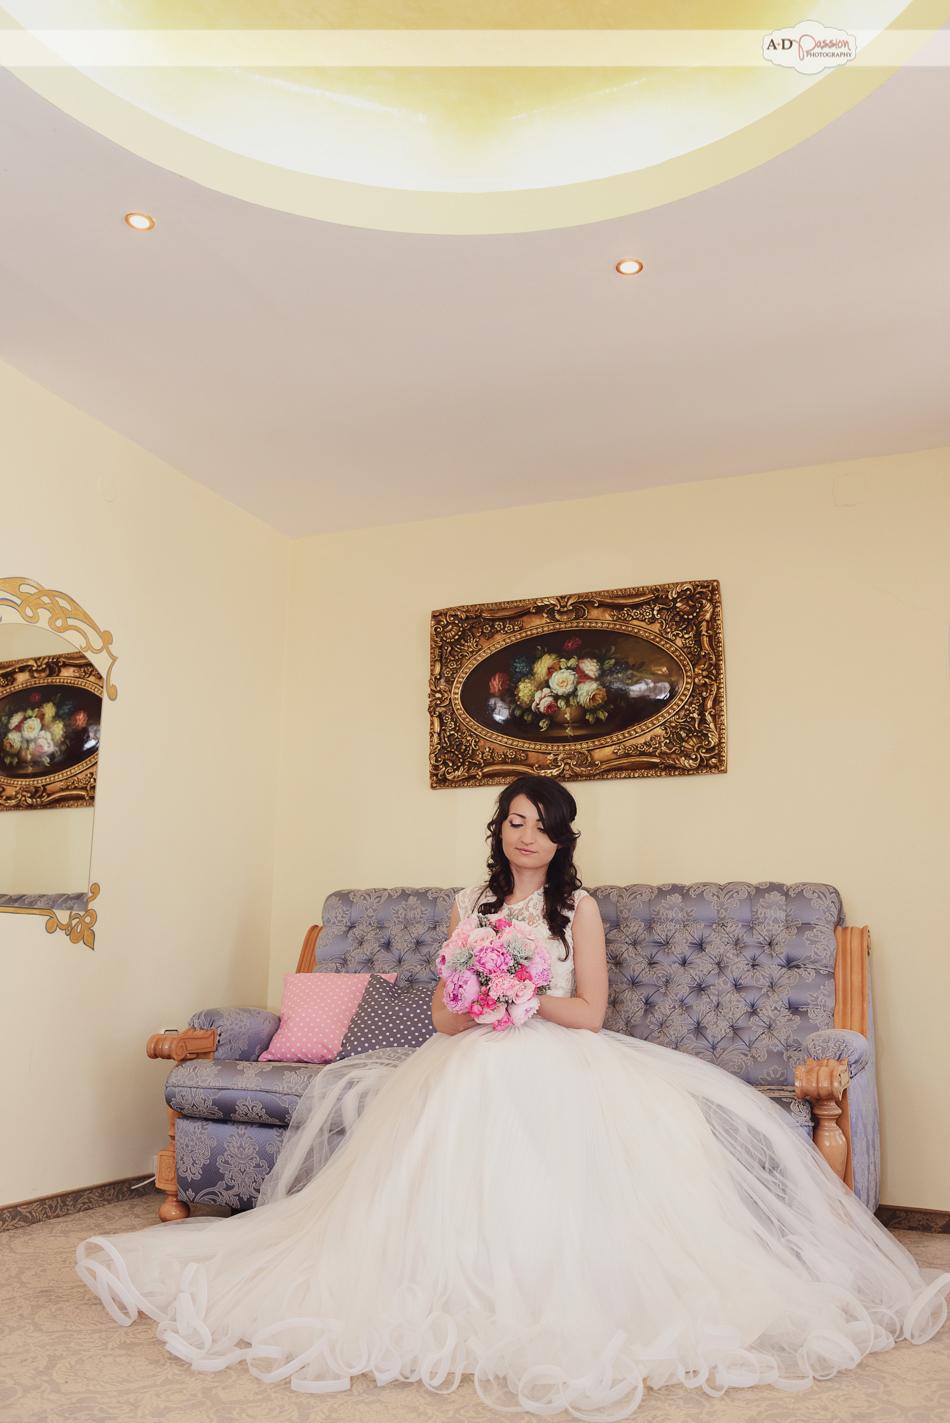 AD Passion Photography | nunta-andreea-si-ovi_nunta-vintage-timisoara-fotograf-de-nunta-profesionist_045 | Adelin, Dida, fotograf profesionist, fotograf de nunta, fotografie de nunta, fotograf Timisoara, fotograf Craiova, fotograf Bucuresti, fotograf Arad, nunta Timisoara, nunta Arad, nunta Bucuresti, nunta Craiova